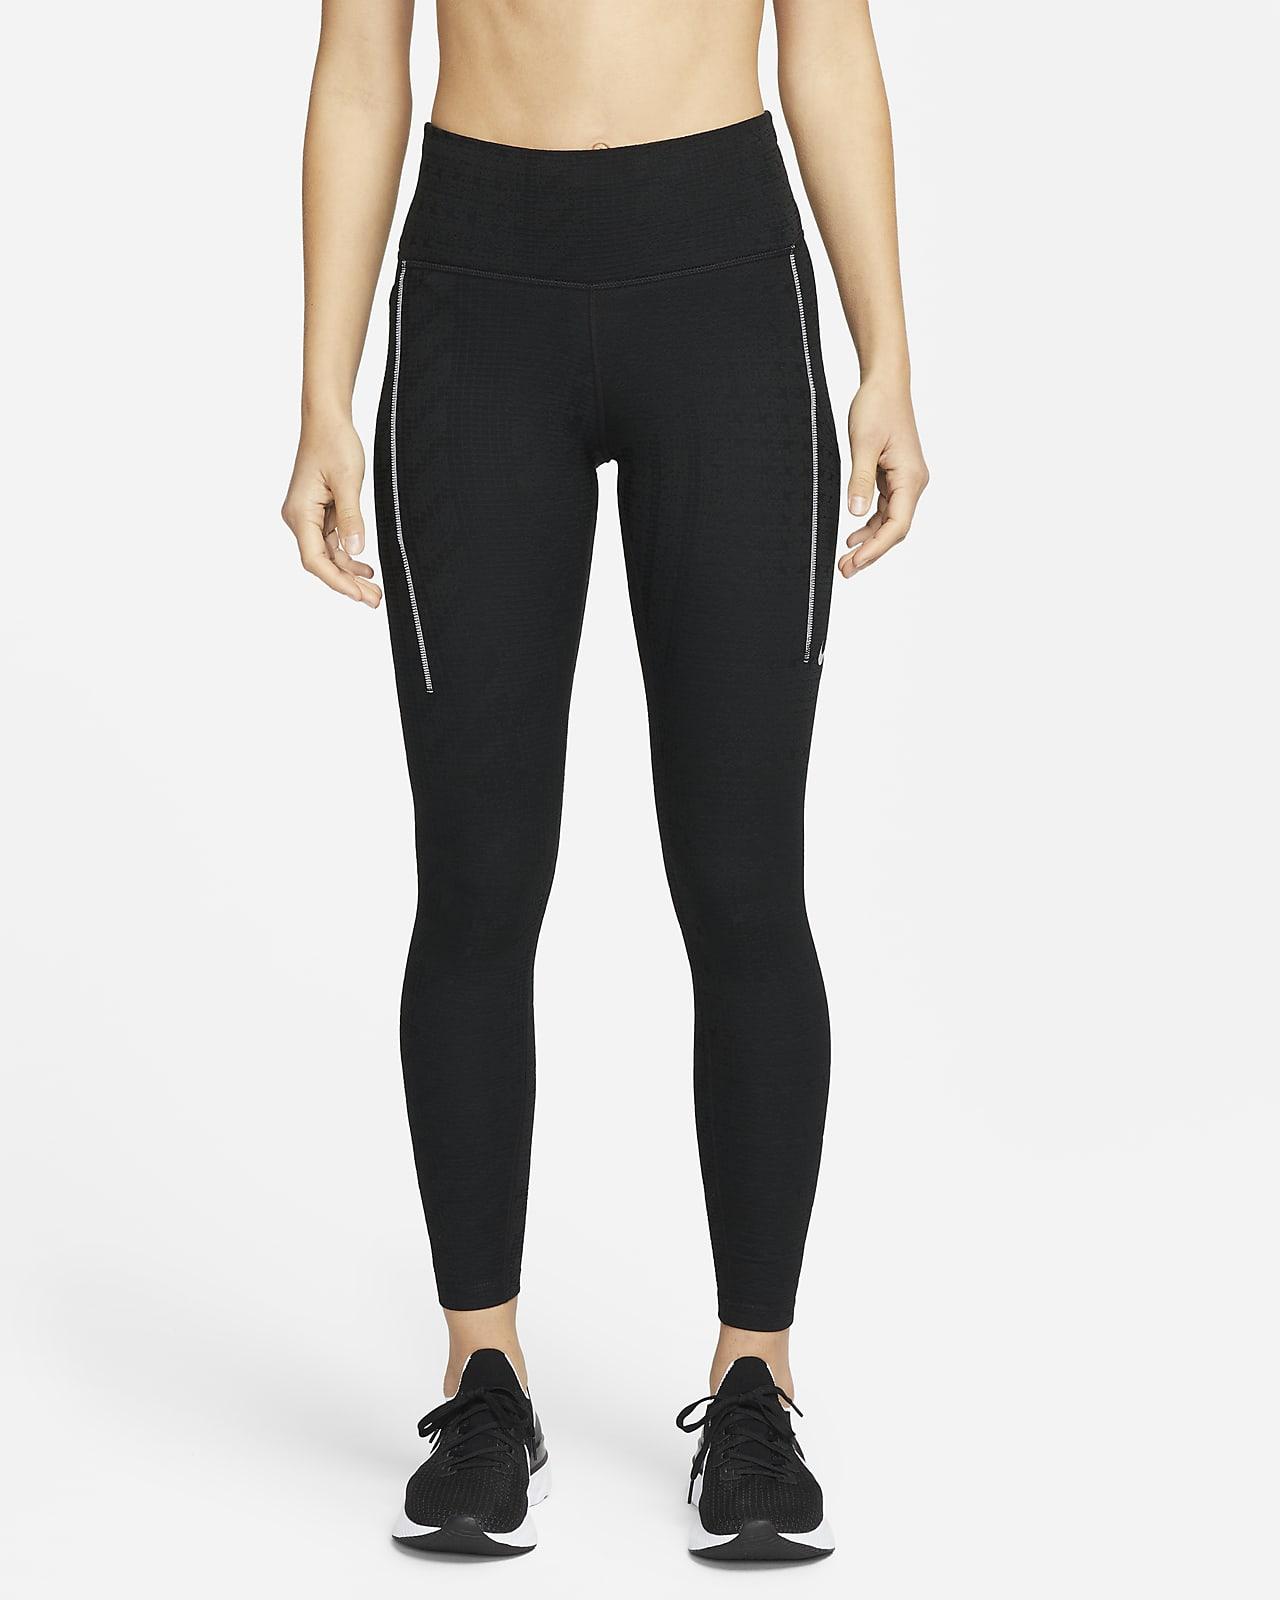 Nike Therma-FIT ADV Epic Luxe-løbeleggings til kvinder